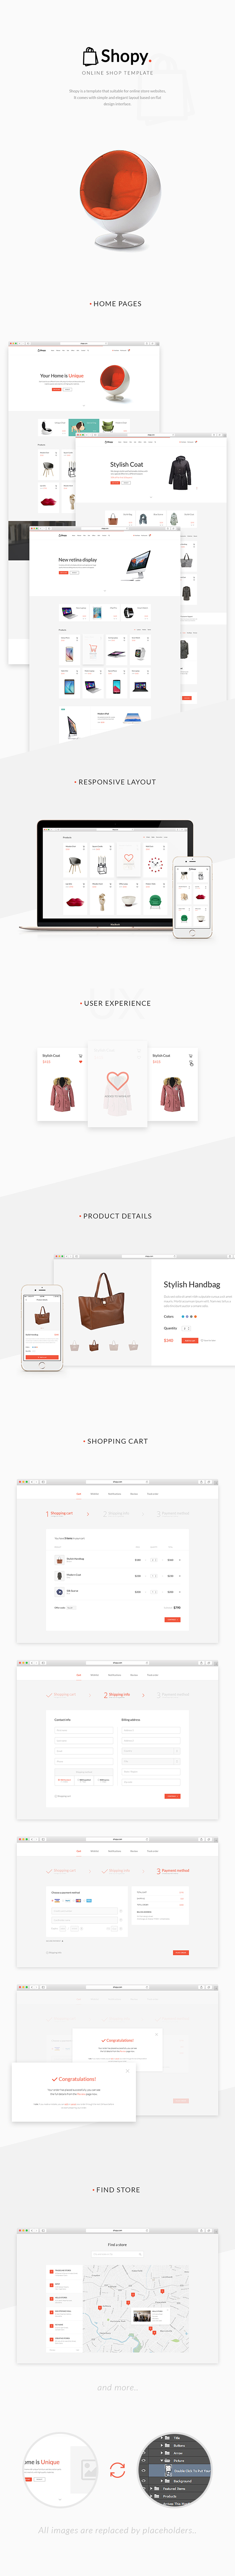 WordPress主題 Shopy 電子商務服裝零售WooCommerce在線銷售漢化主題[更新至v1.0.2]